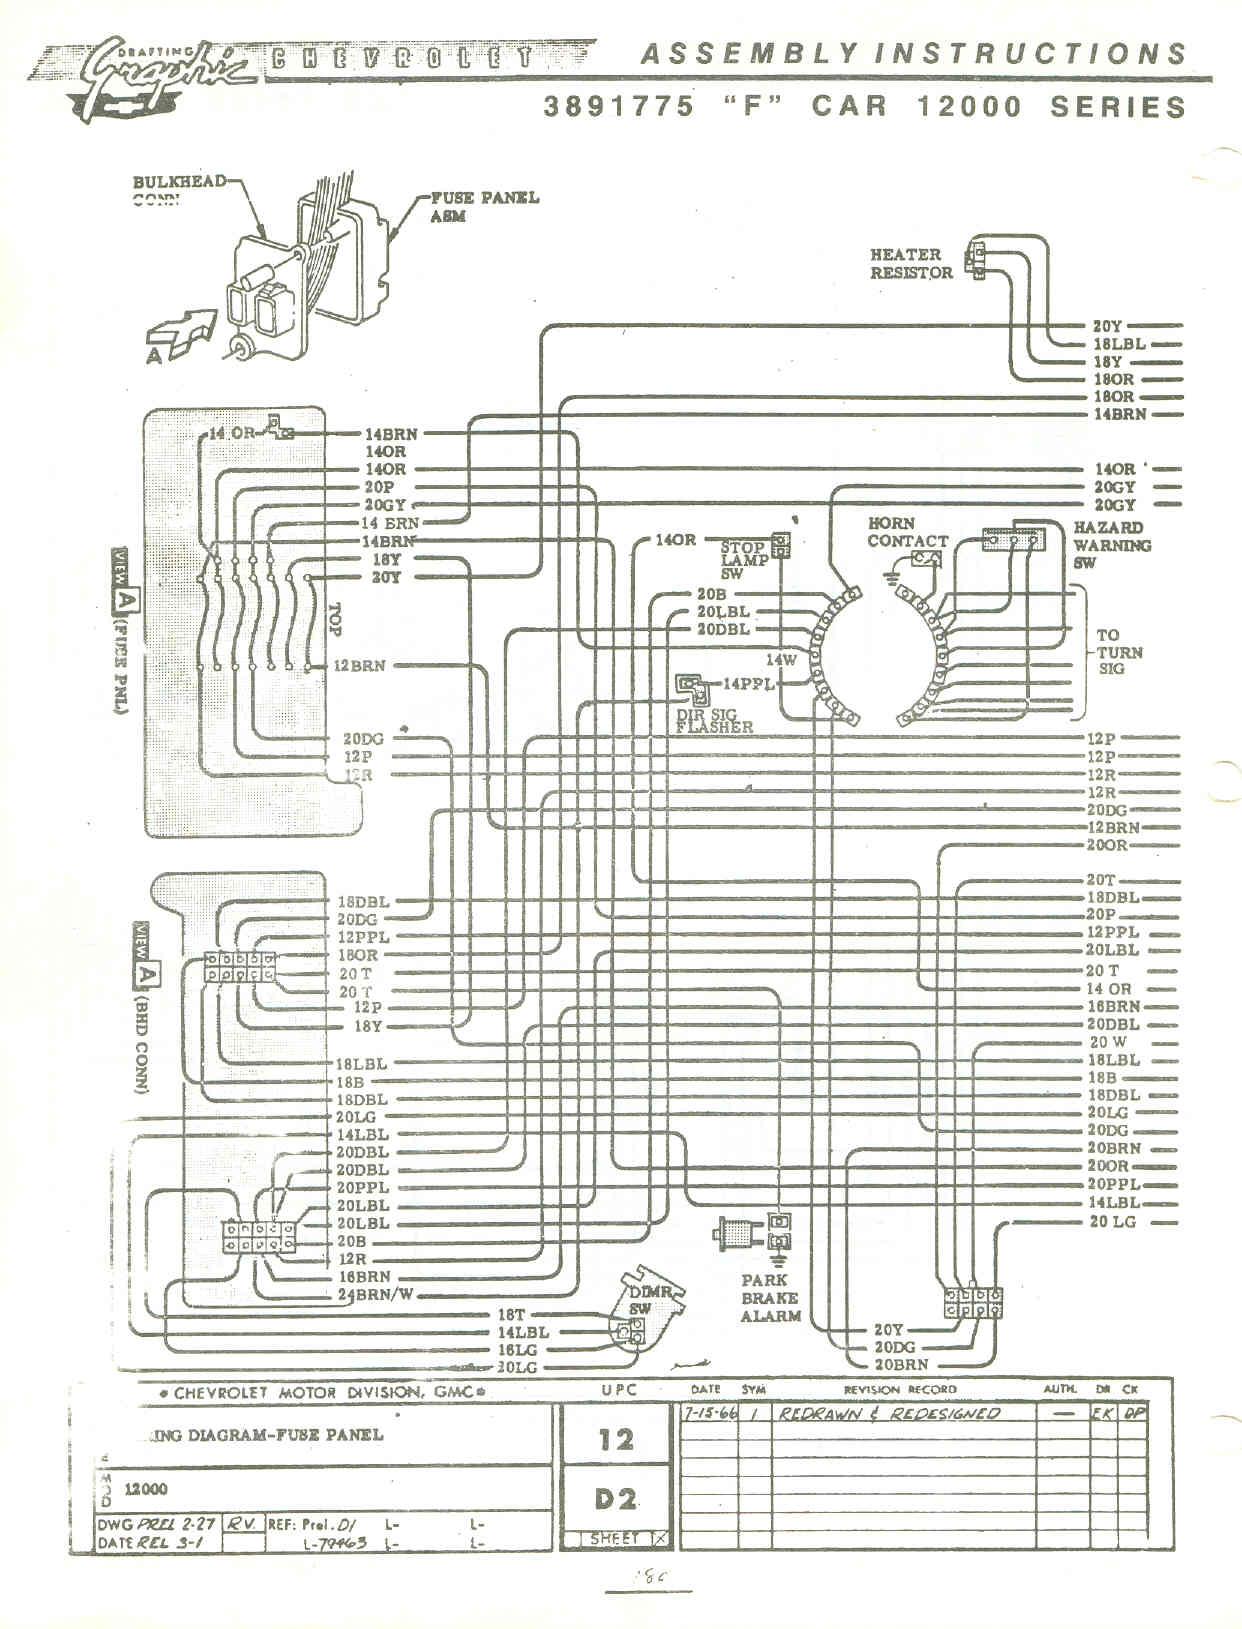 1967 camaro ignition wiring diagram 1968 camaro ignition key switch wire diagram wiring wiring  1968 camaro ignition key switch wire